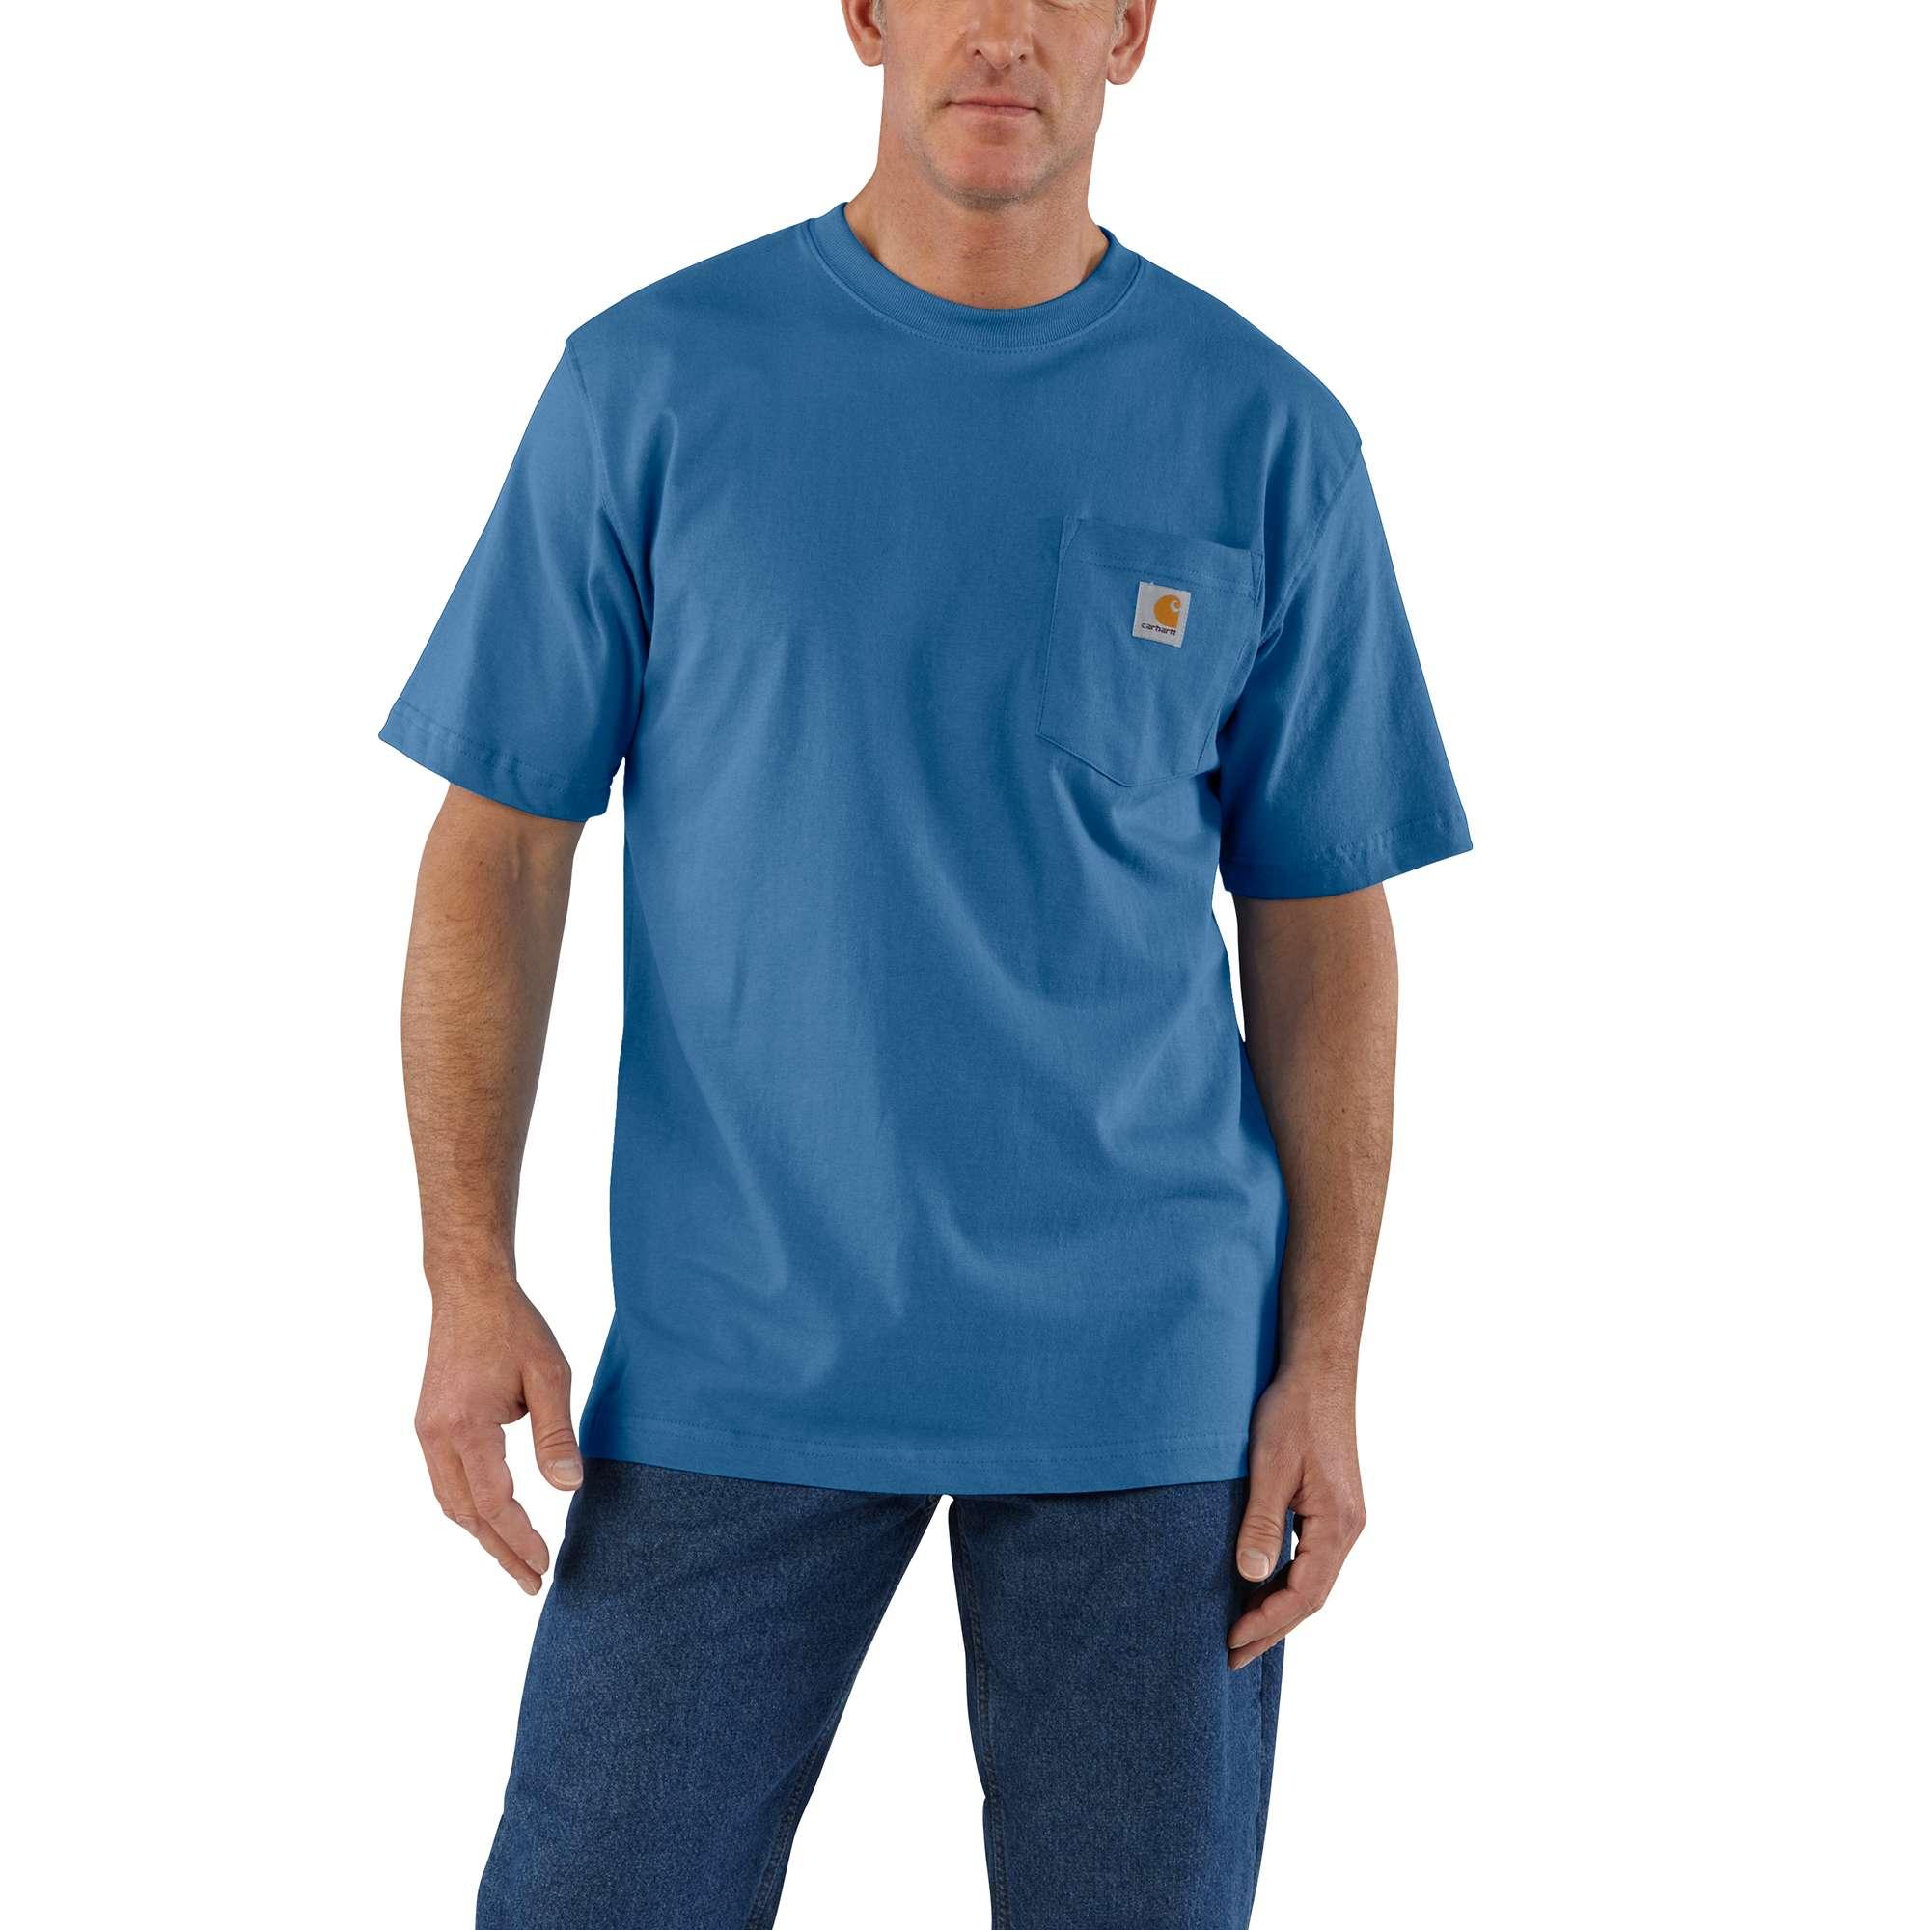 Men's Workwear Pocket Tee, Royal Blue/Navy, swatch